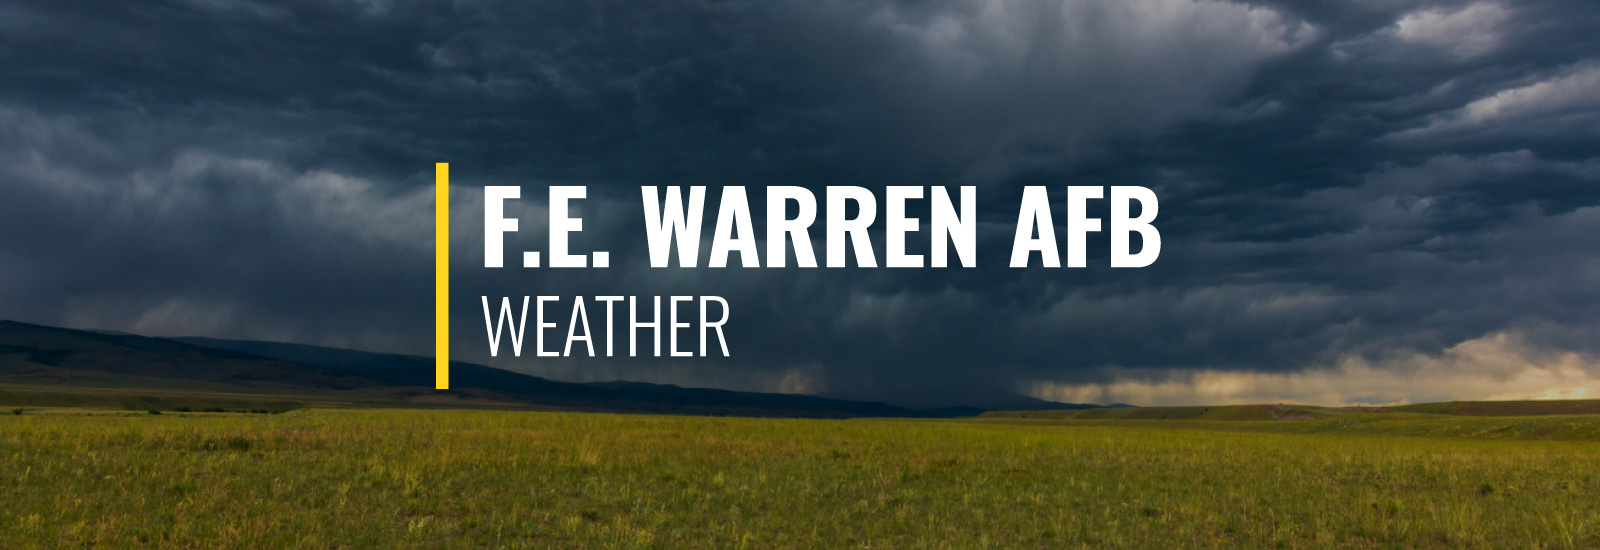 F. E. Warren AFB Weather